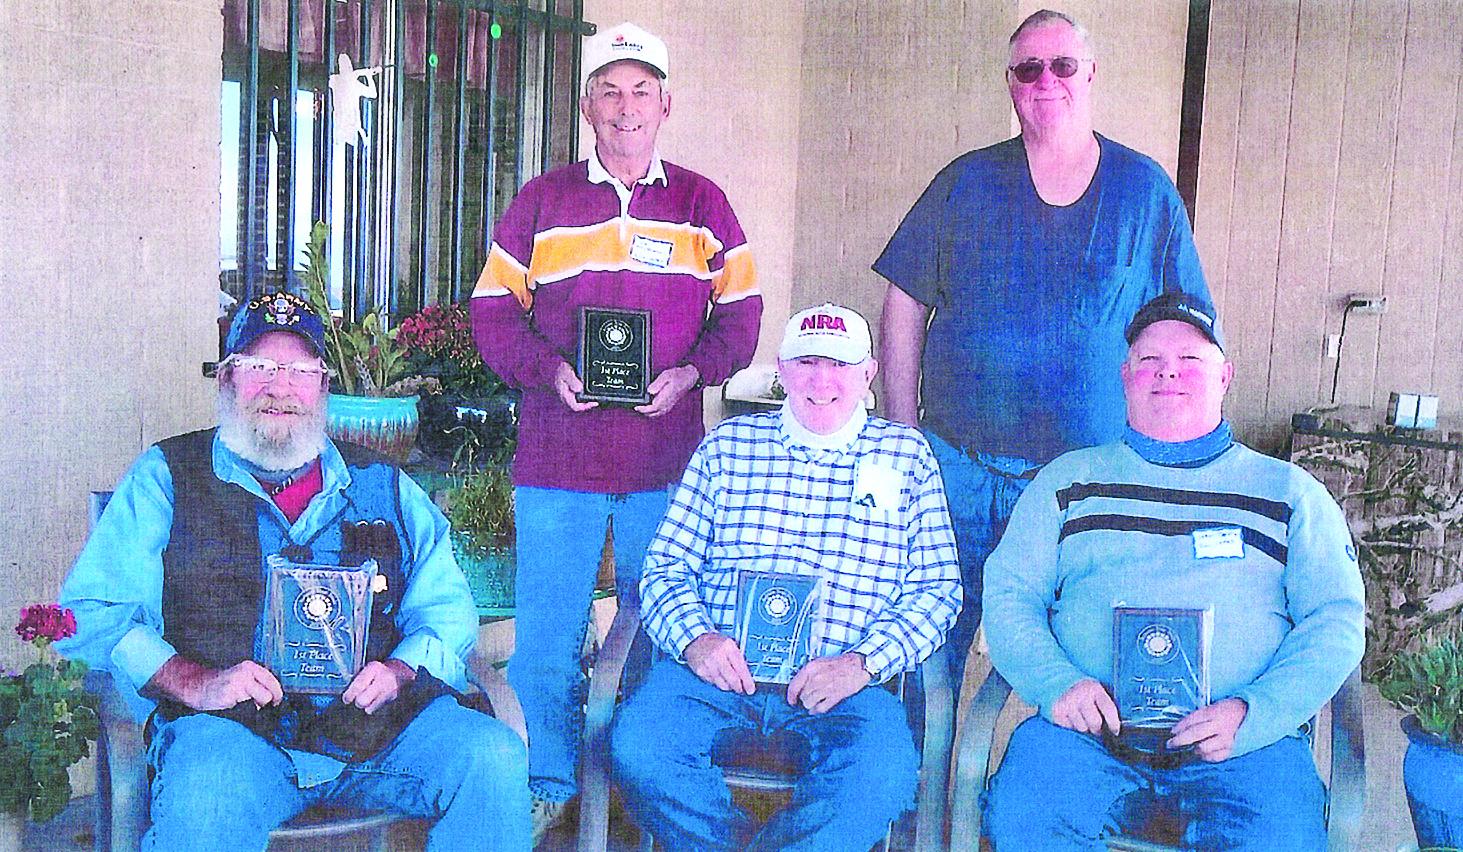 Sun Lakes team (left to right): Mac Mackerman, 69; Ted Tenbroeck, 73; Frank Nance, 68; Charles Chapman, 71; and Sean Jeffries, 65